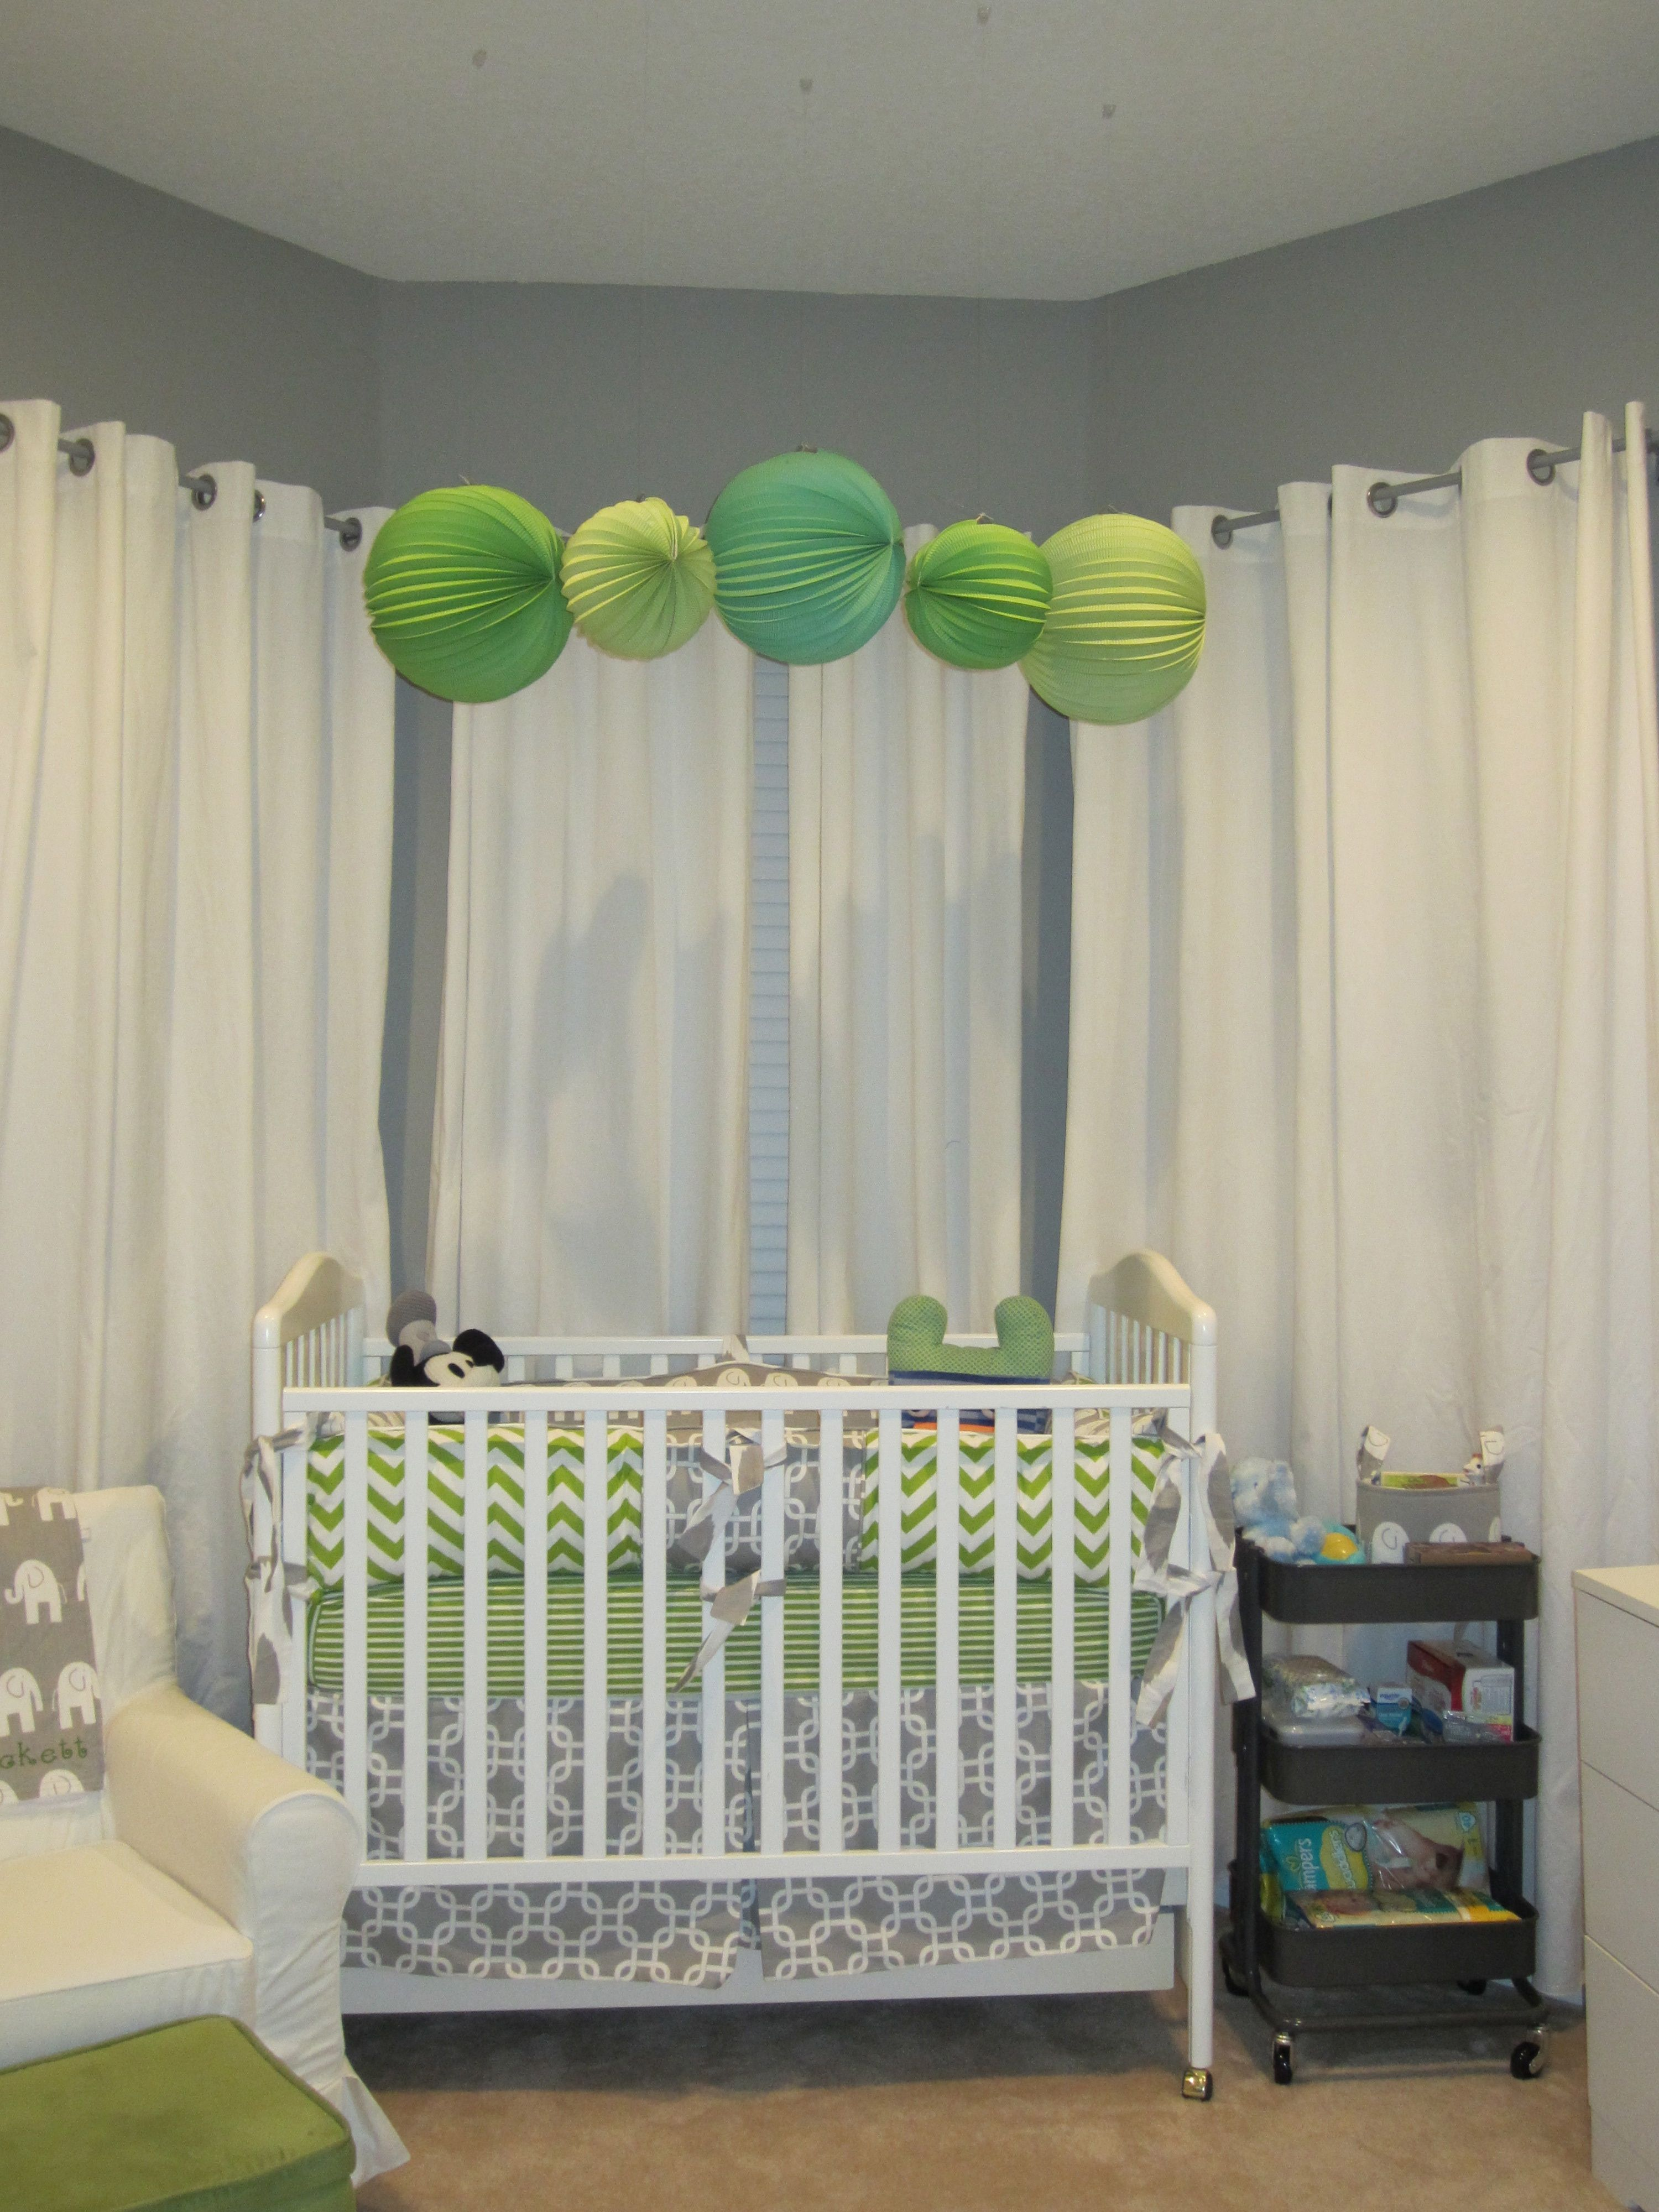 Master bedroom nook  I love the idea of nursery nook in the master bedroom for the first